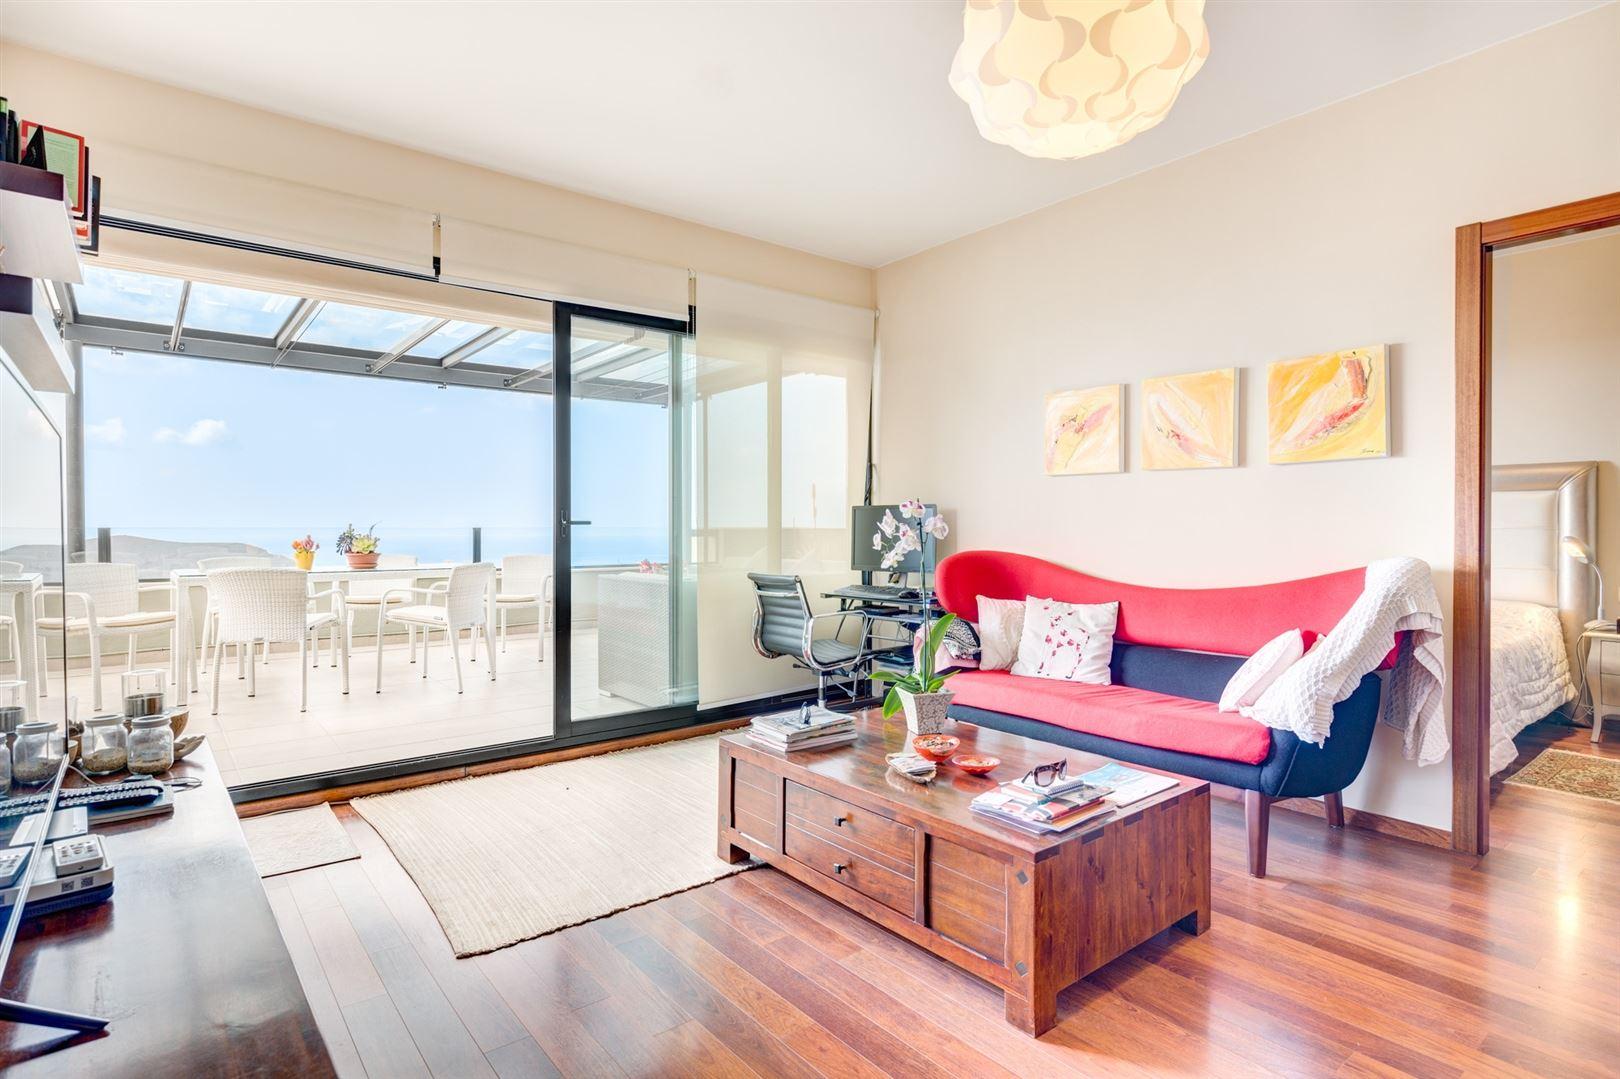 Foto 8 : Appartement te  TENERIFE (Spanje) - Prijs € 645.000